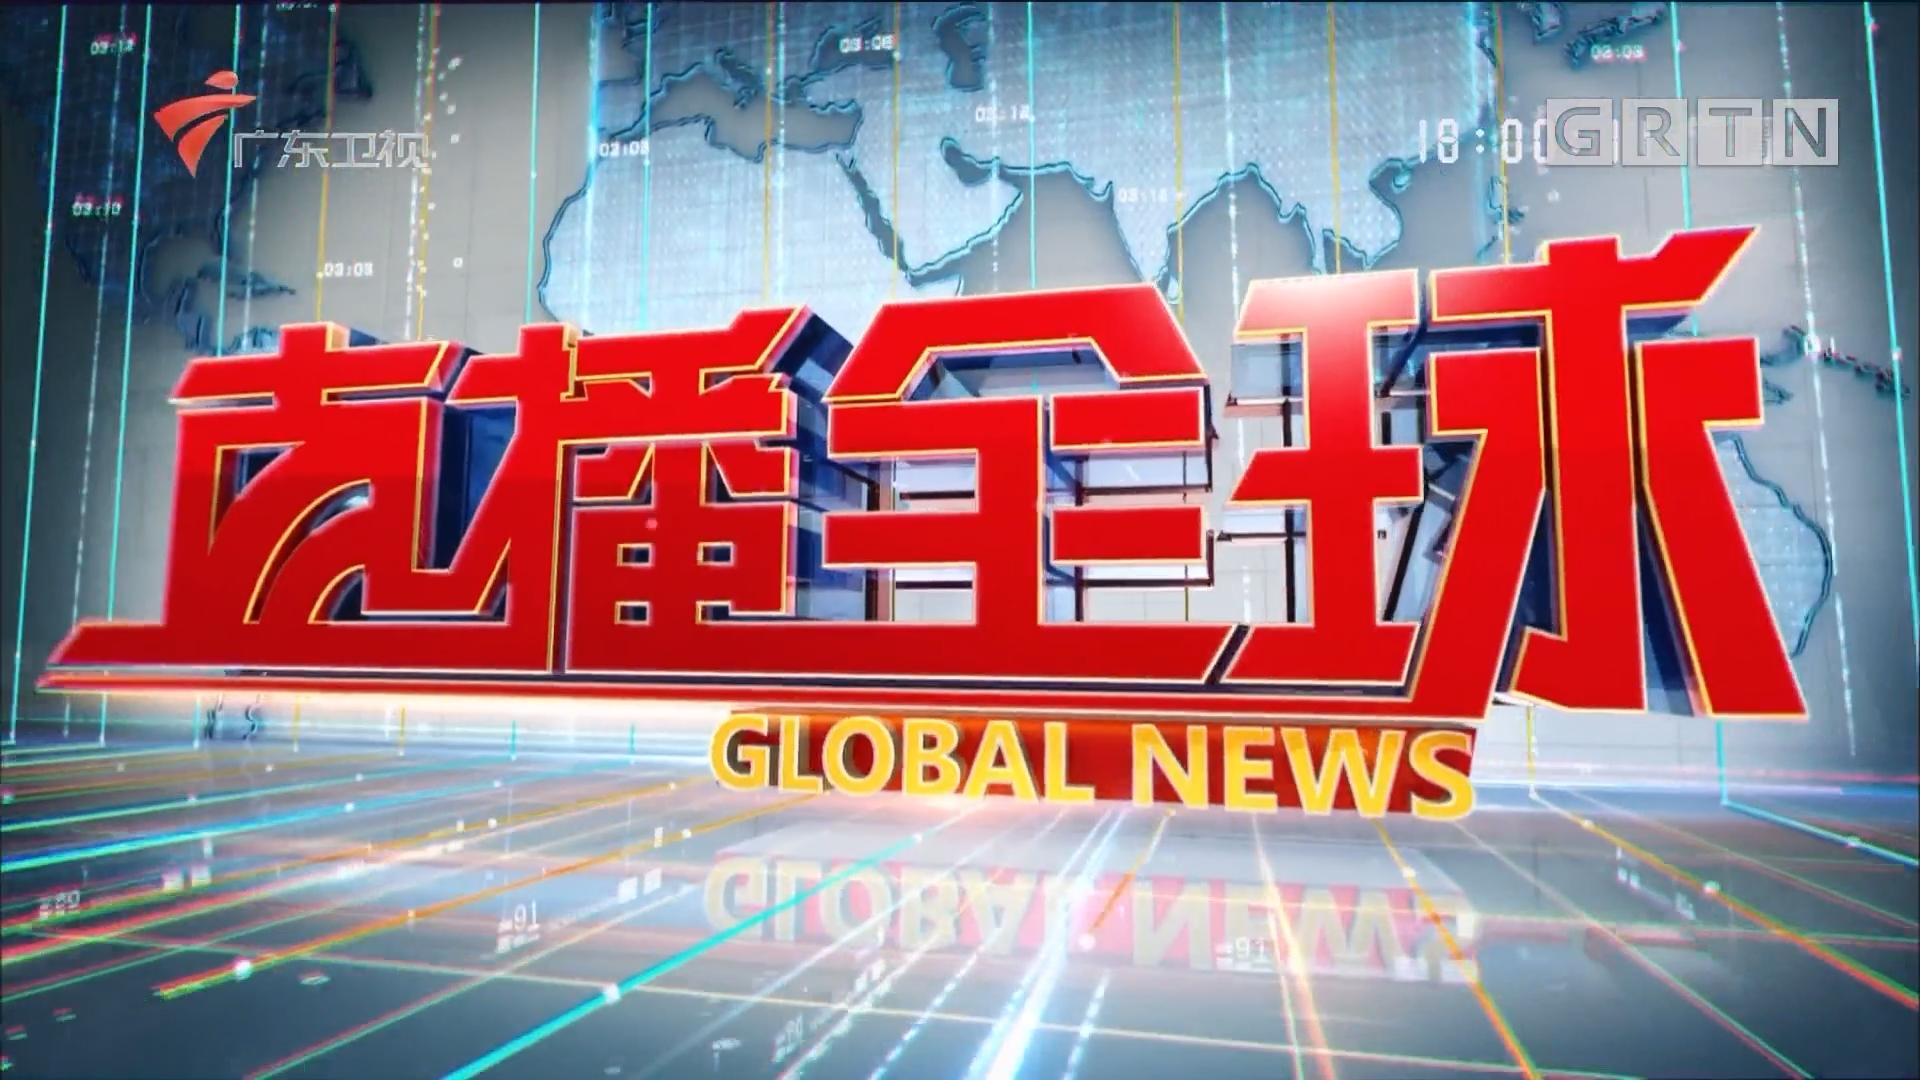 [HD][2018-07-06]直播全球:商务部就美国加征关税发表谈话 美国加征关税行为是贸易霸凌主义